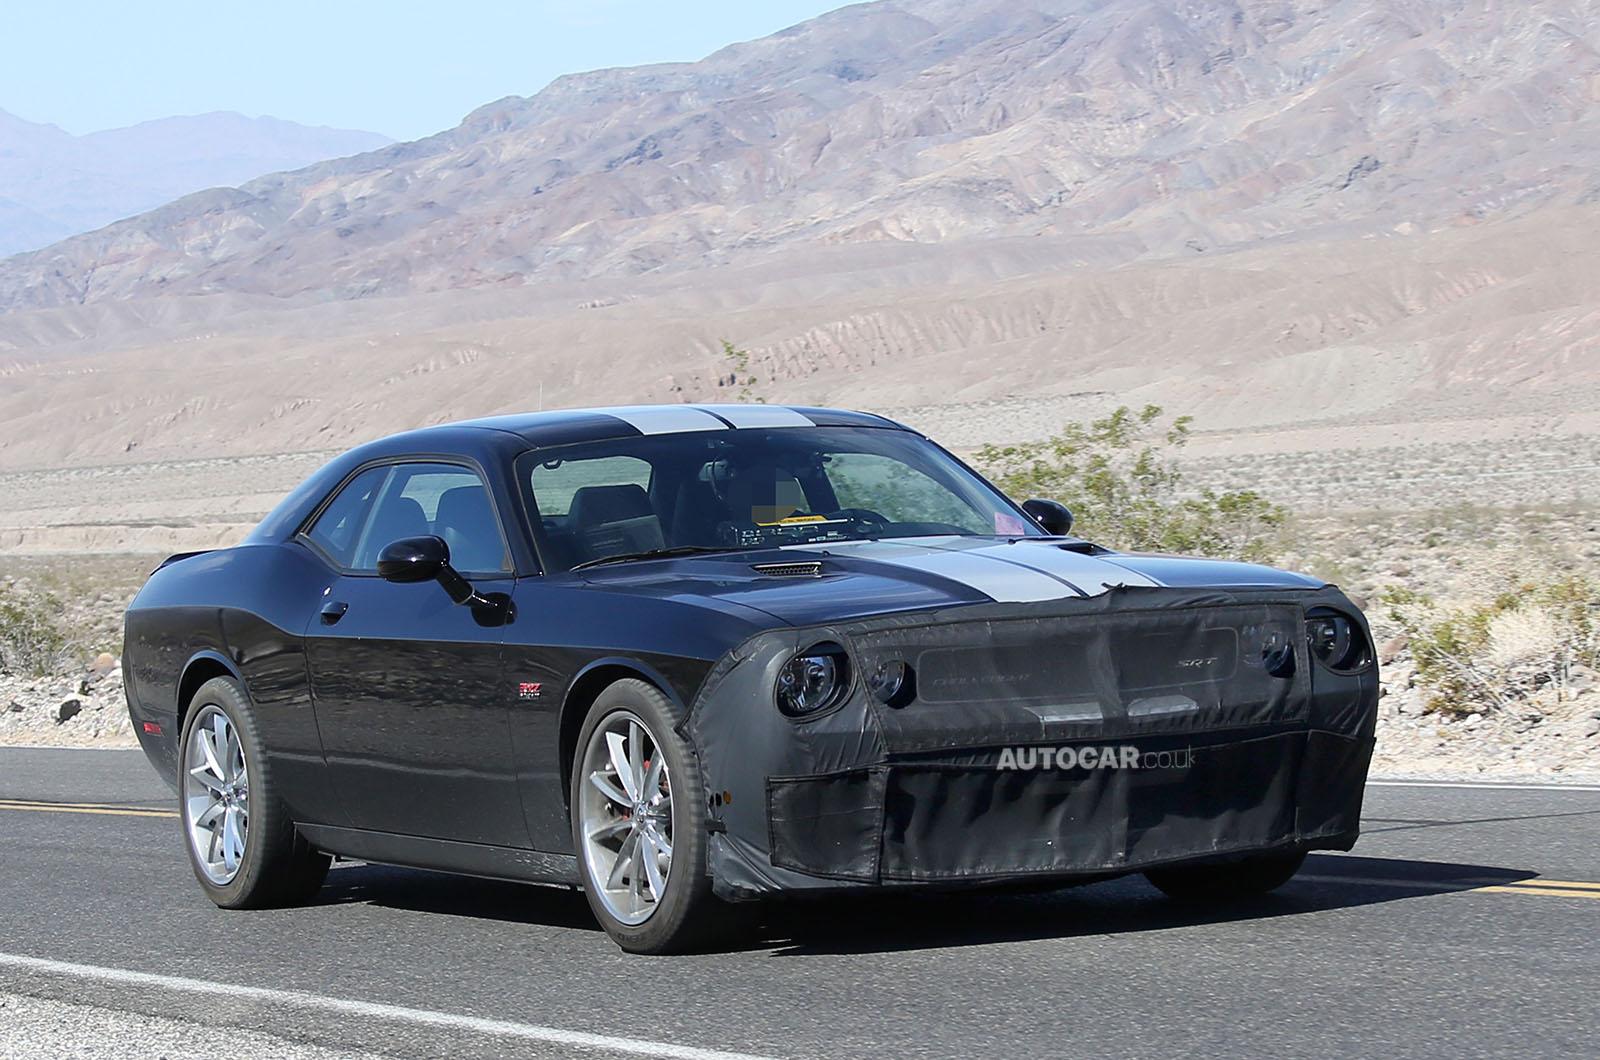 spyshots 600hp 2015 dodge challenger srt8 - Dodge Challenger 2015 Srt8